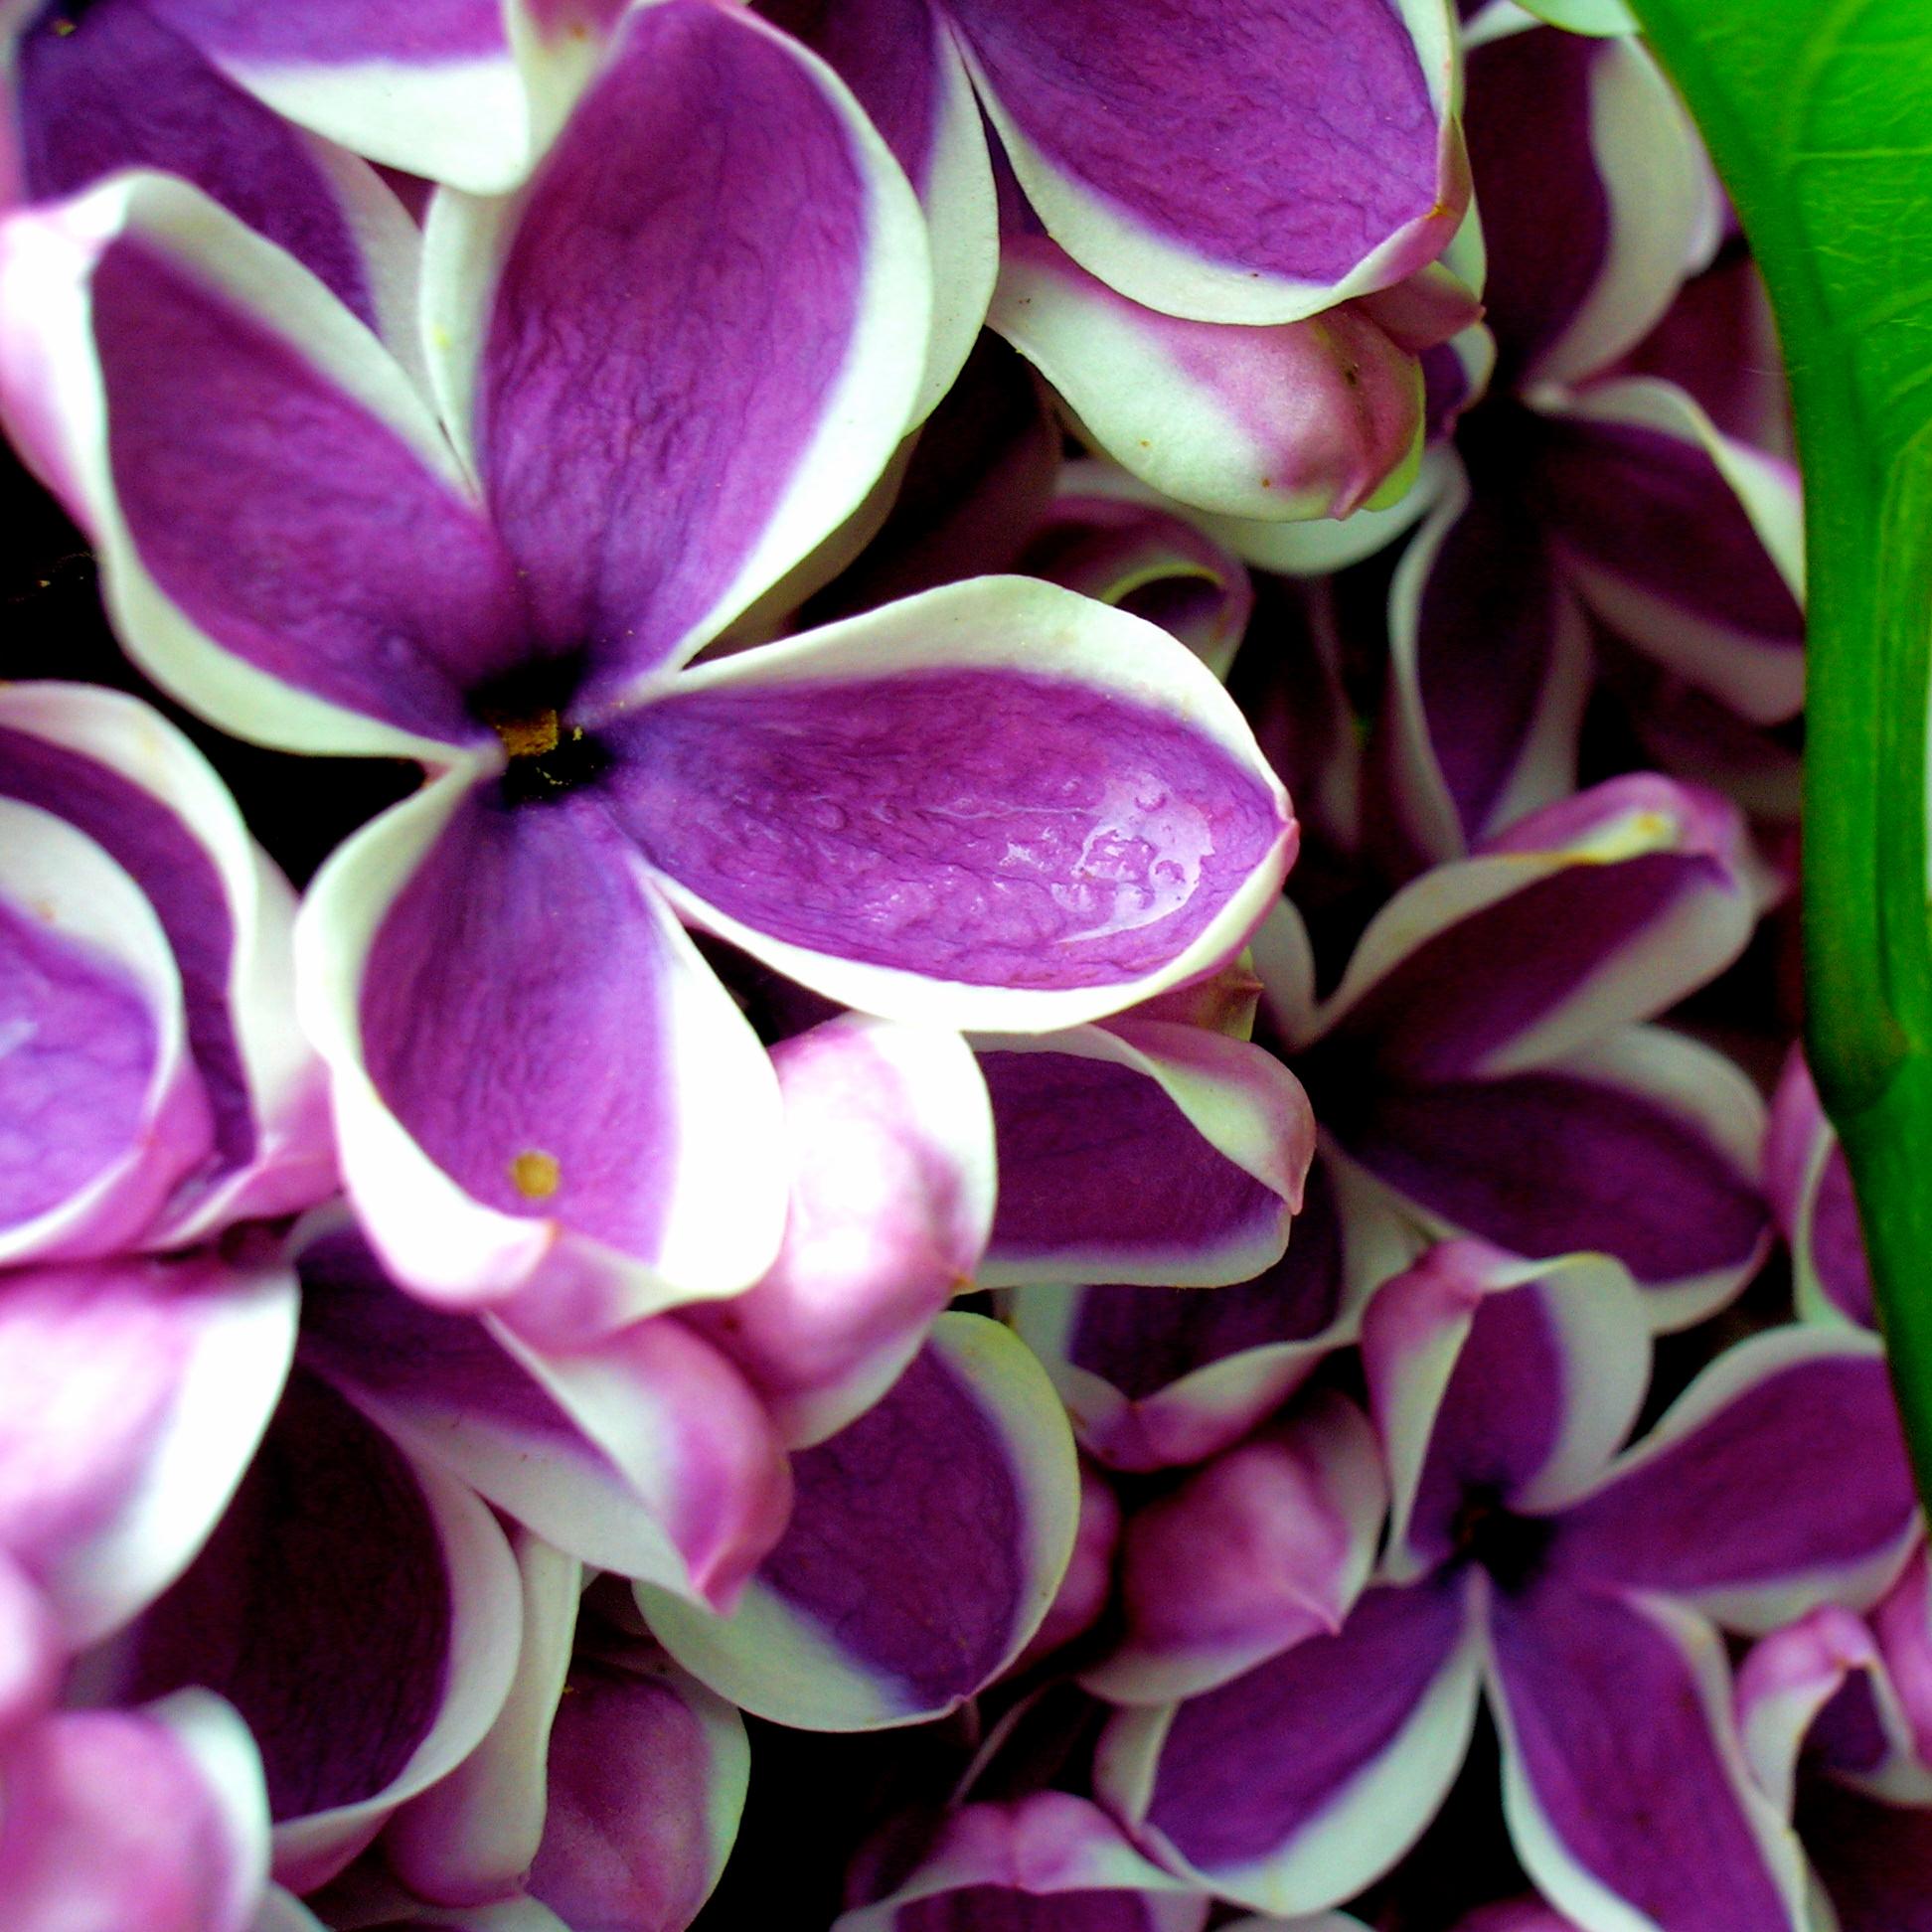 Royal_Botanical_Gardens_Lilac_Celebration.jpg